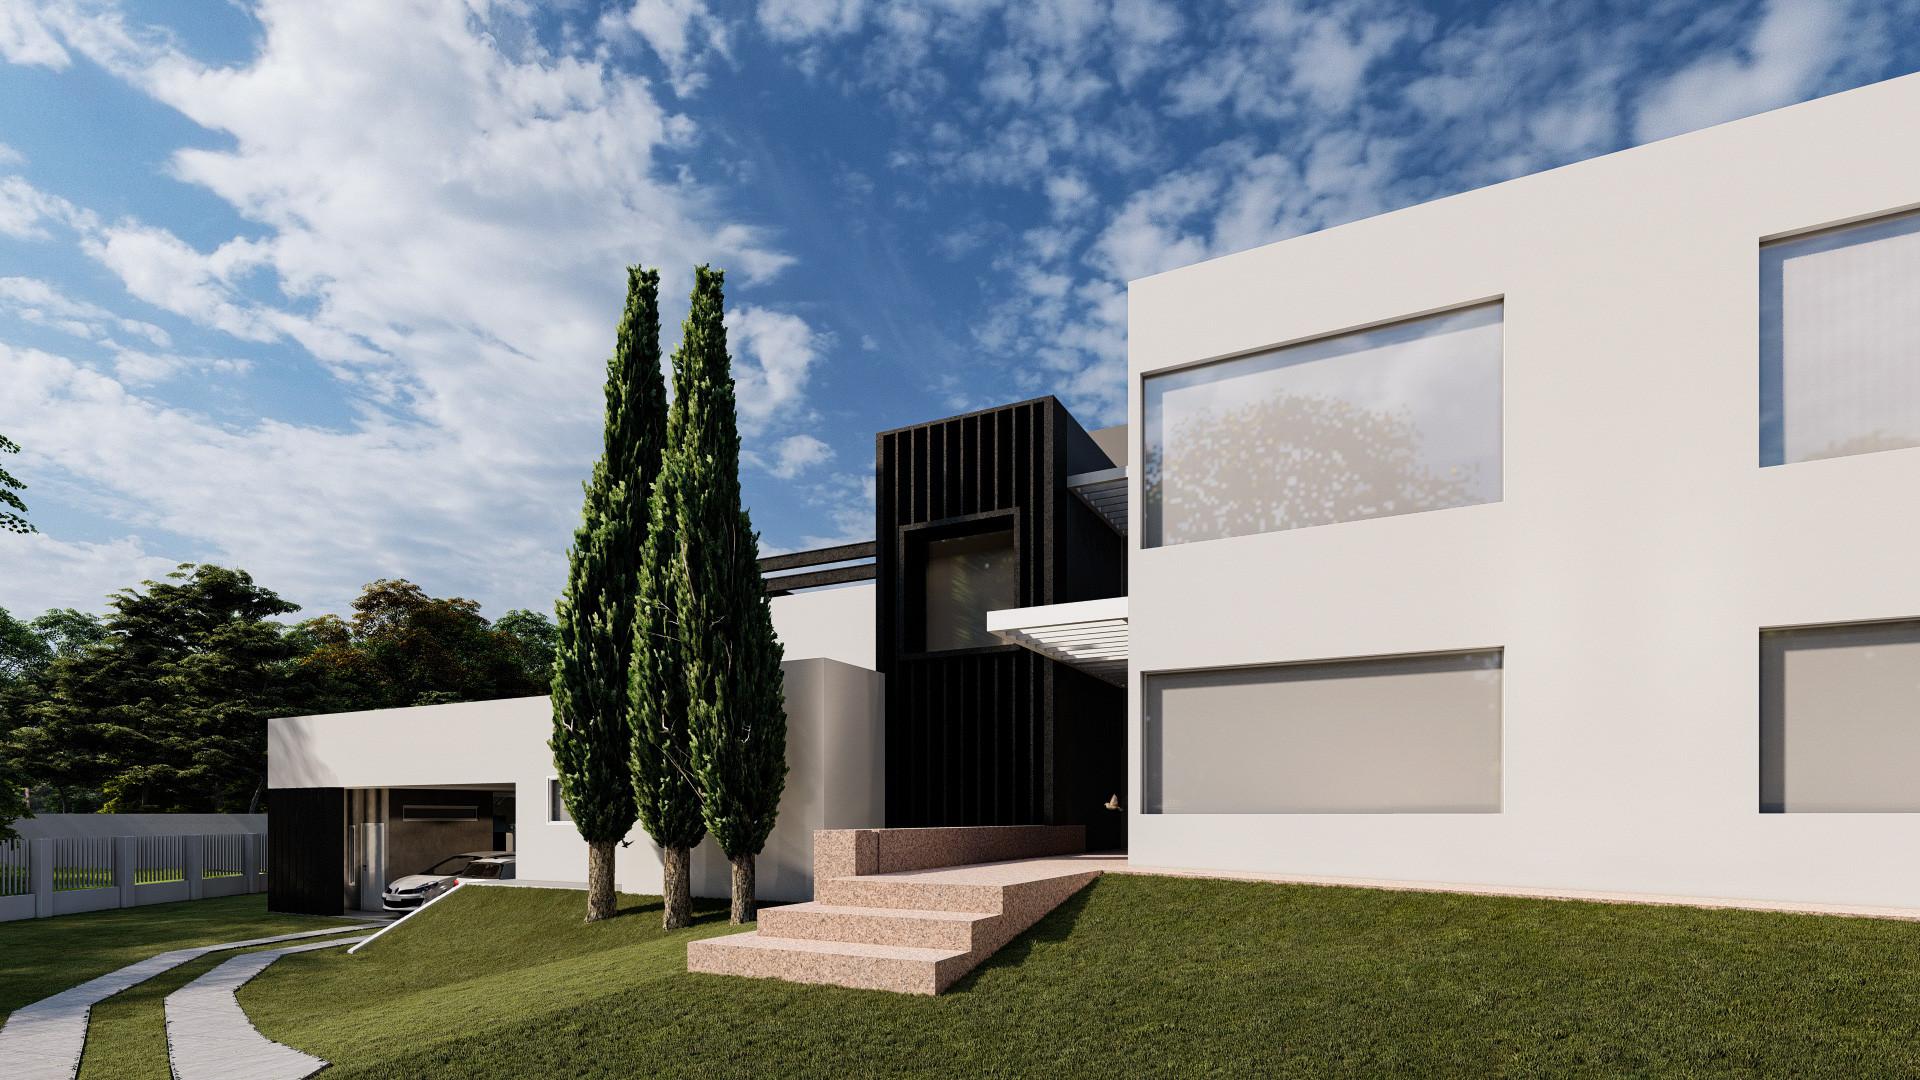 leve_casa novak - numen arquitetura (24)